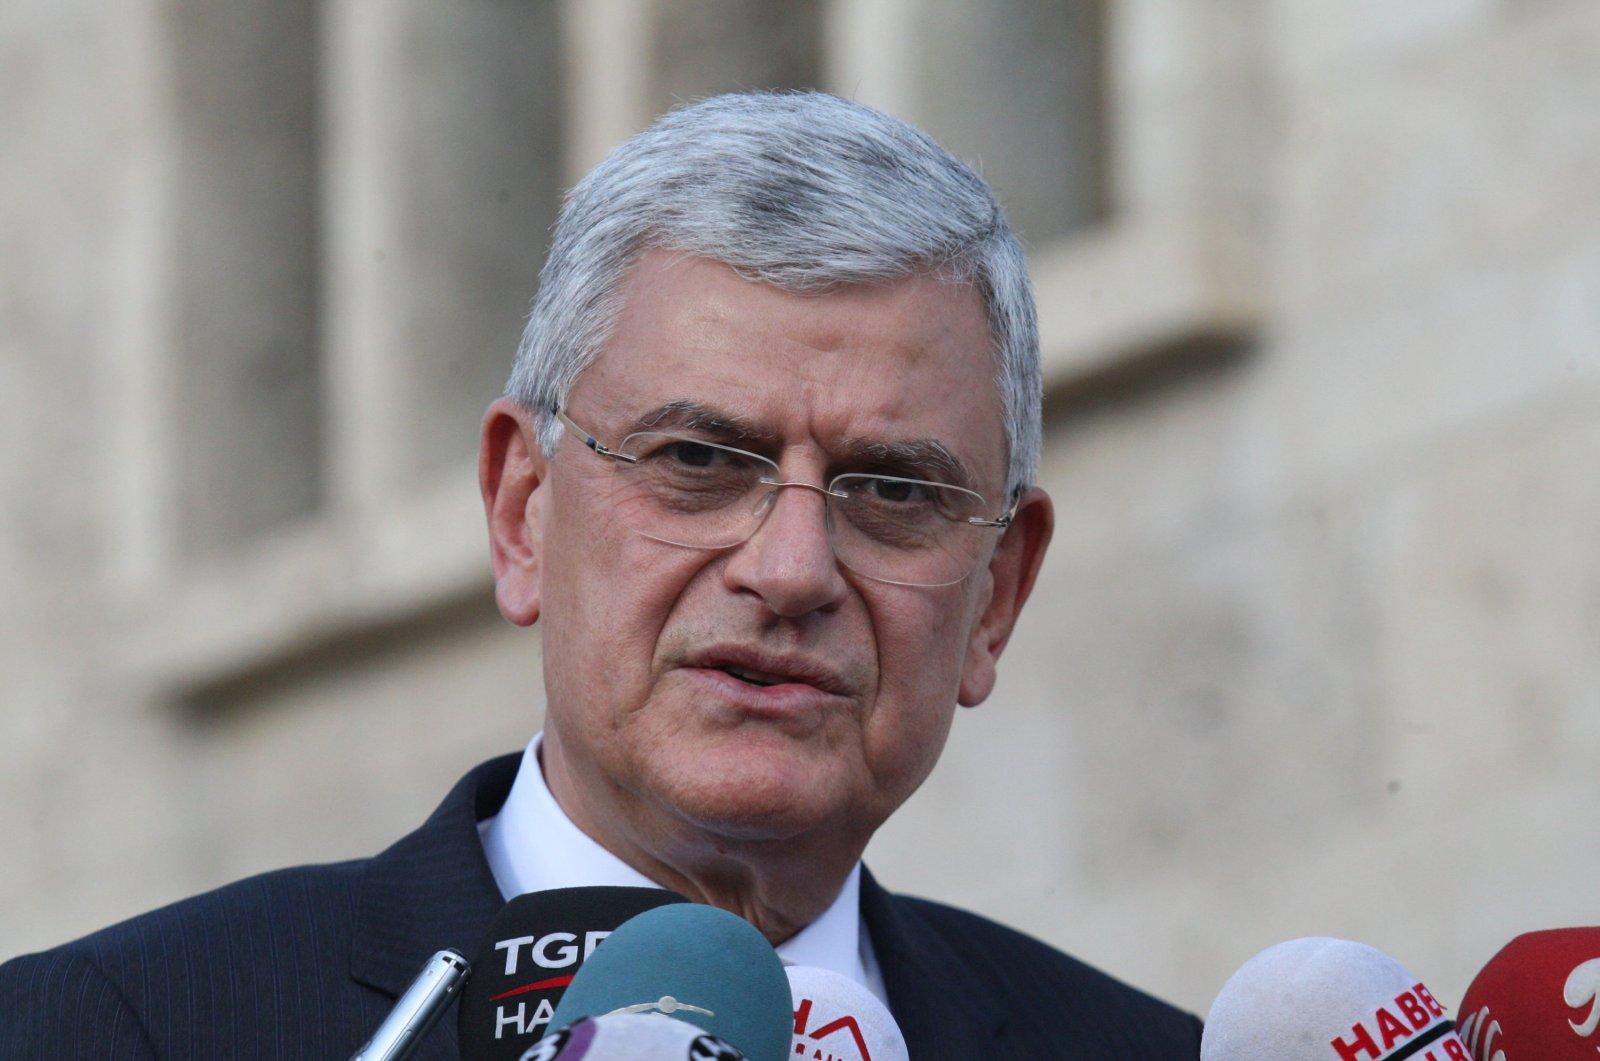 Ambassador Volkan Bozkır seen in this undated photo. (Photo by Ali Ekeyılmaz)